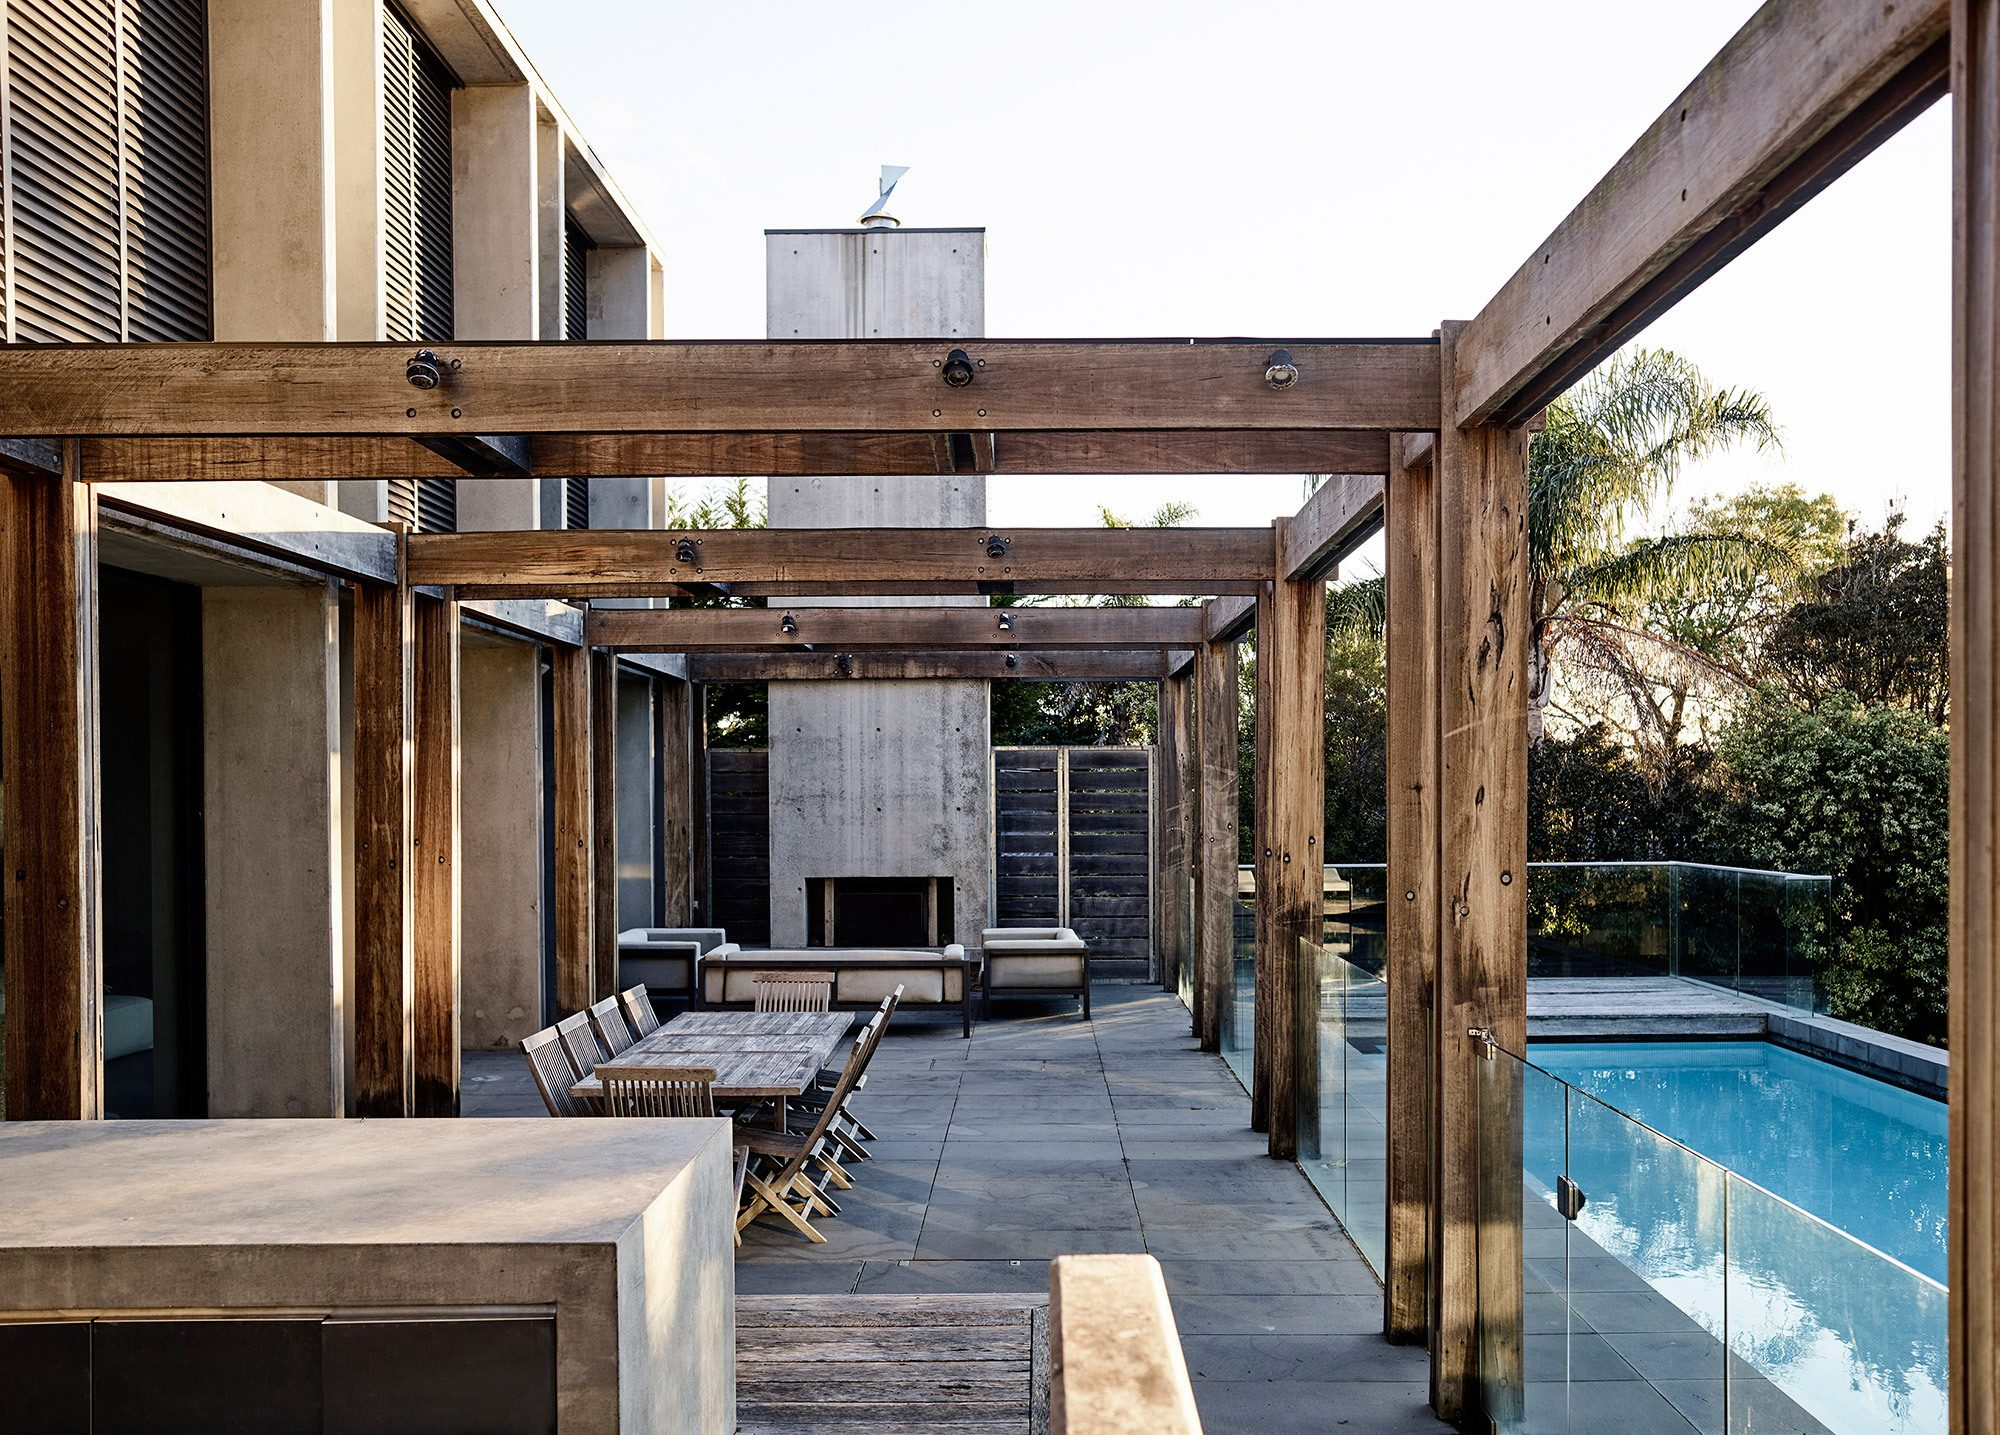 architecture design house interior. Plain Interior Read More On Architecture Design House Interior S